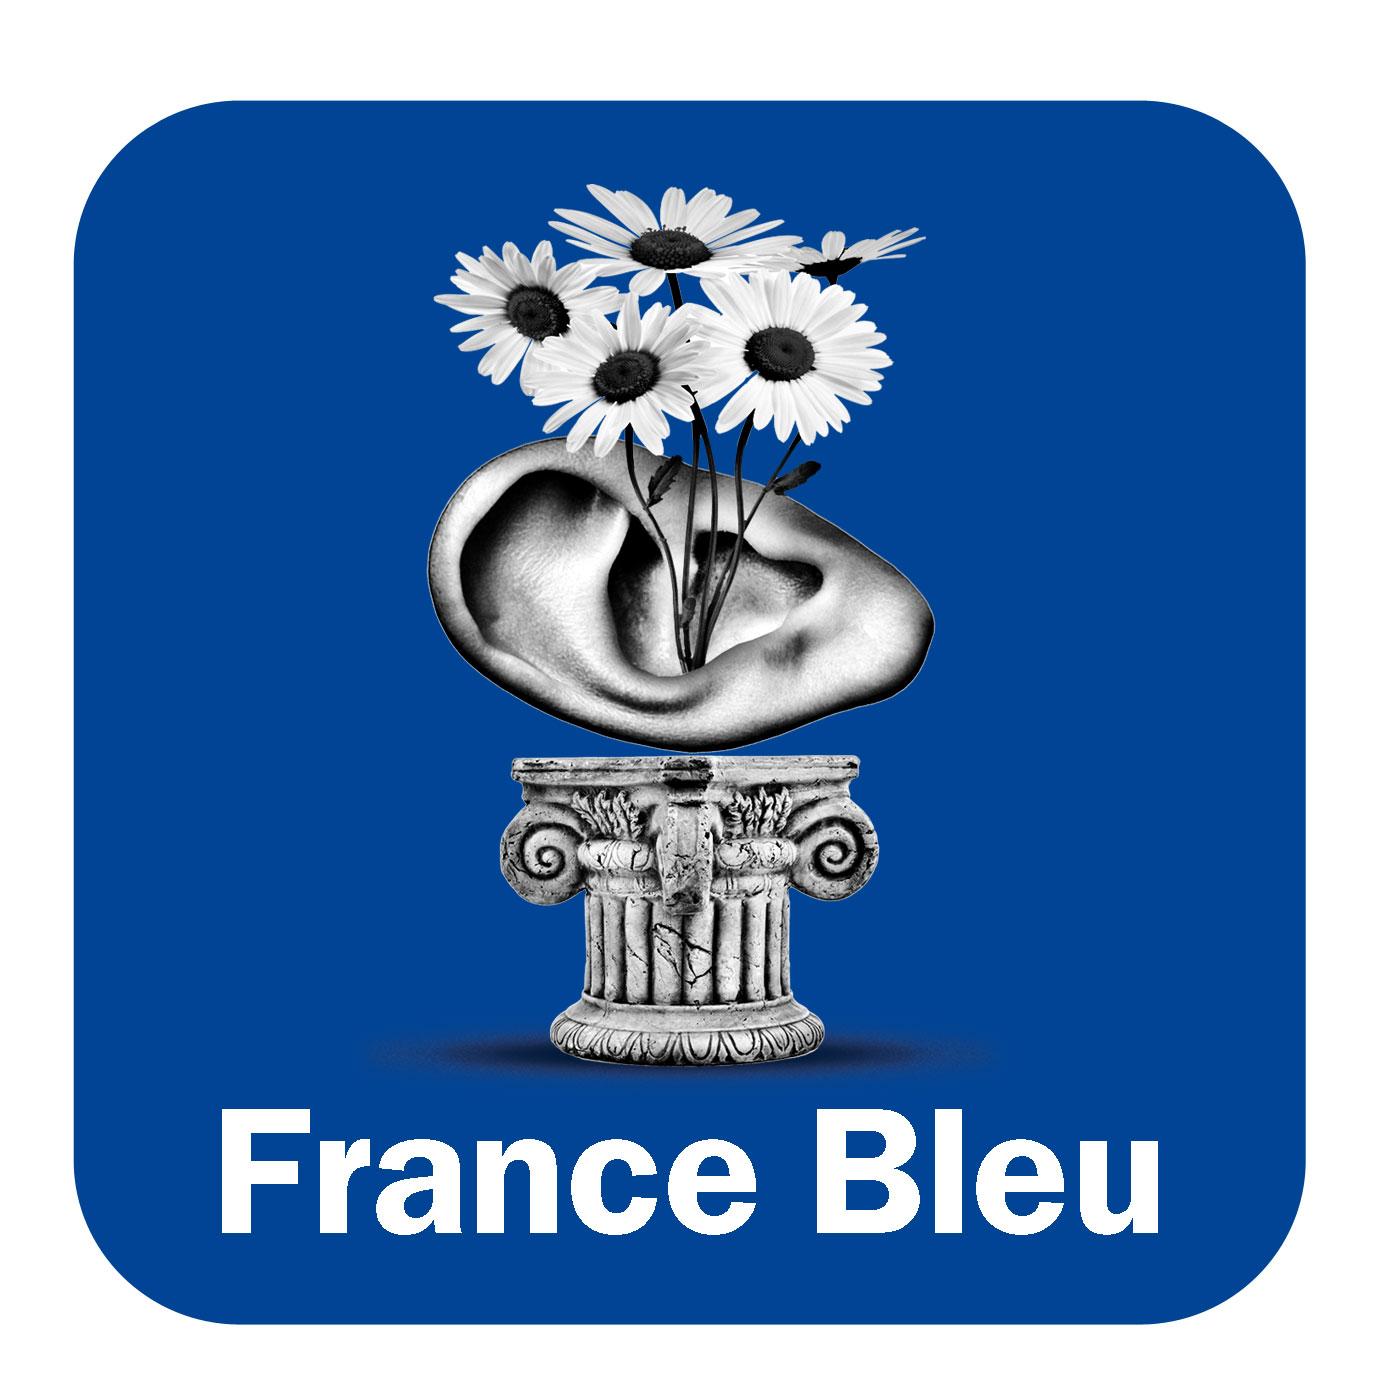 Les experts maison France Bleu Béarn